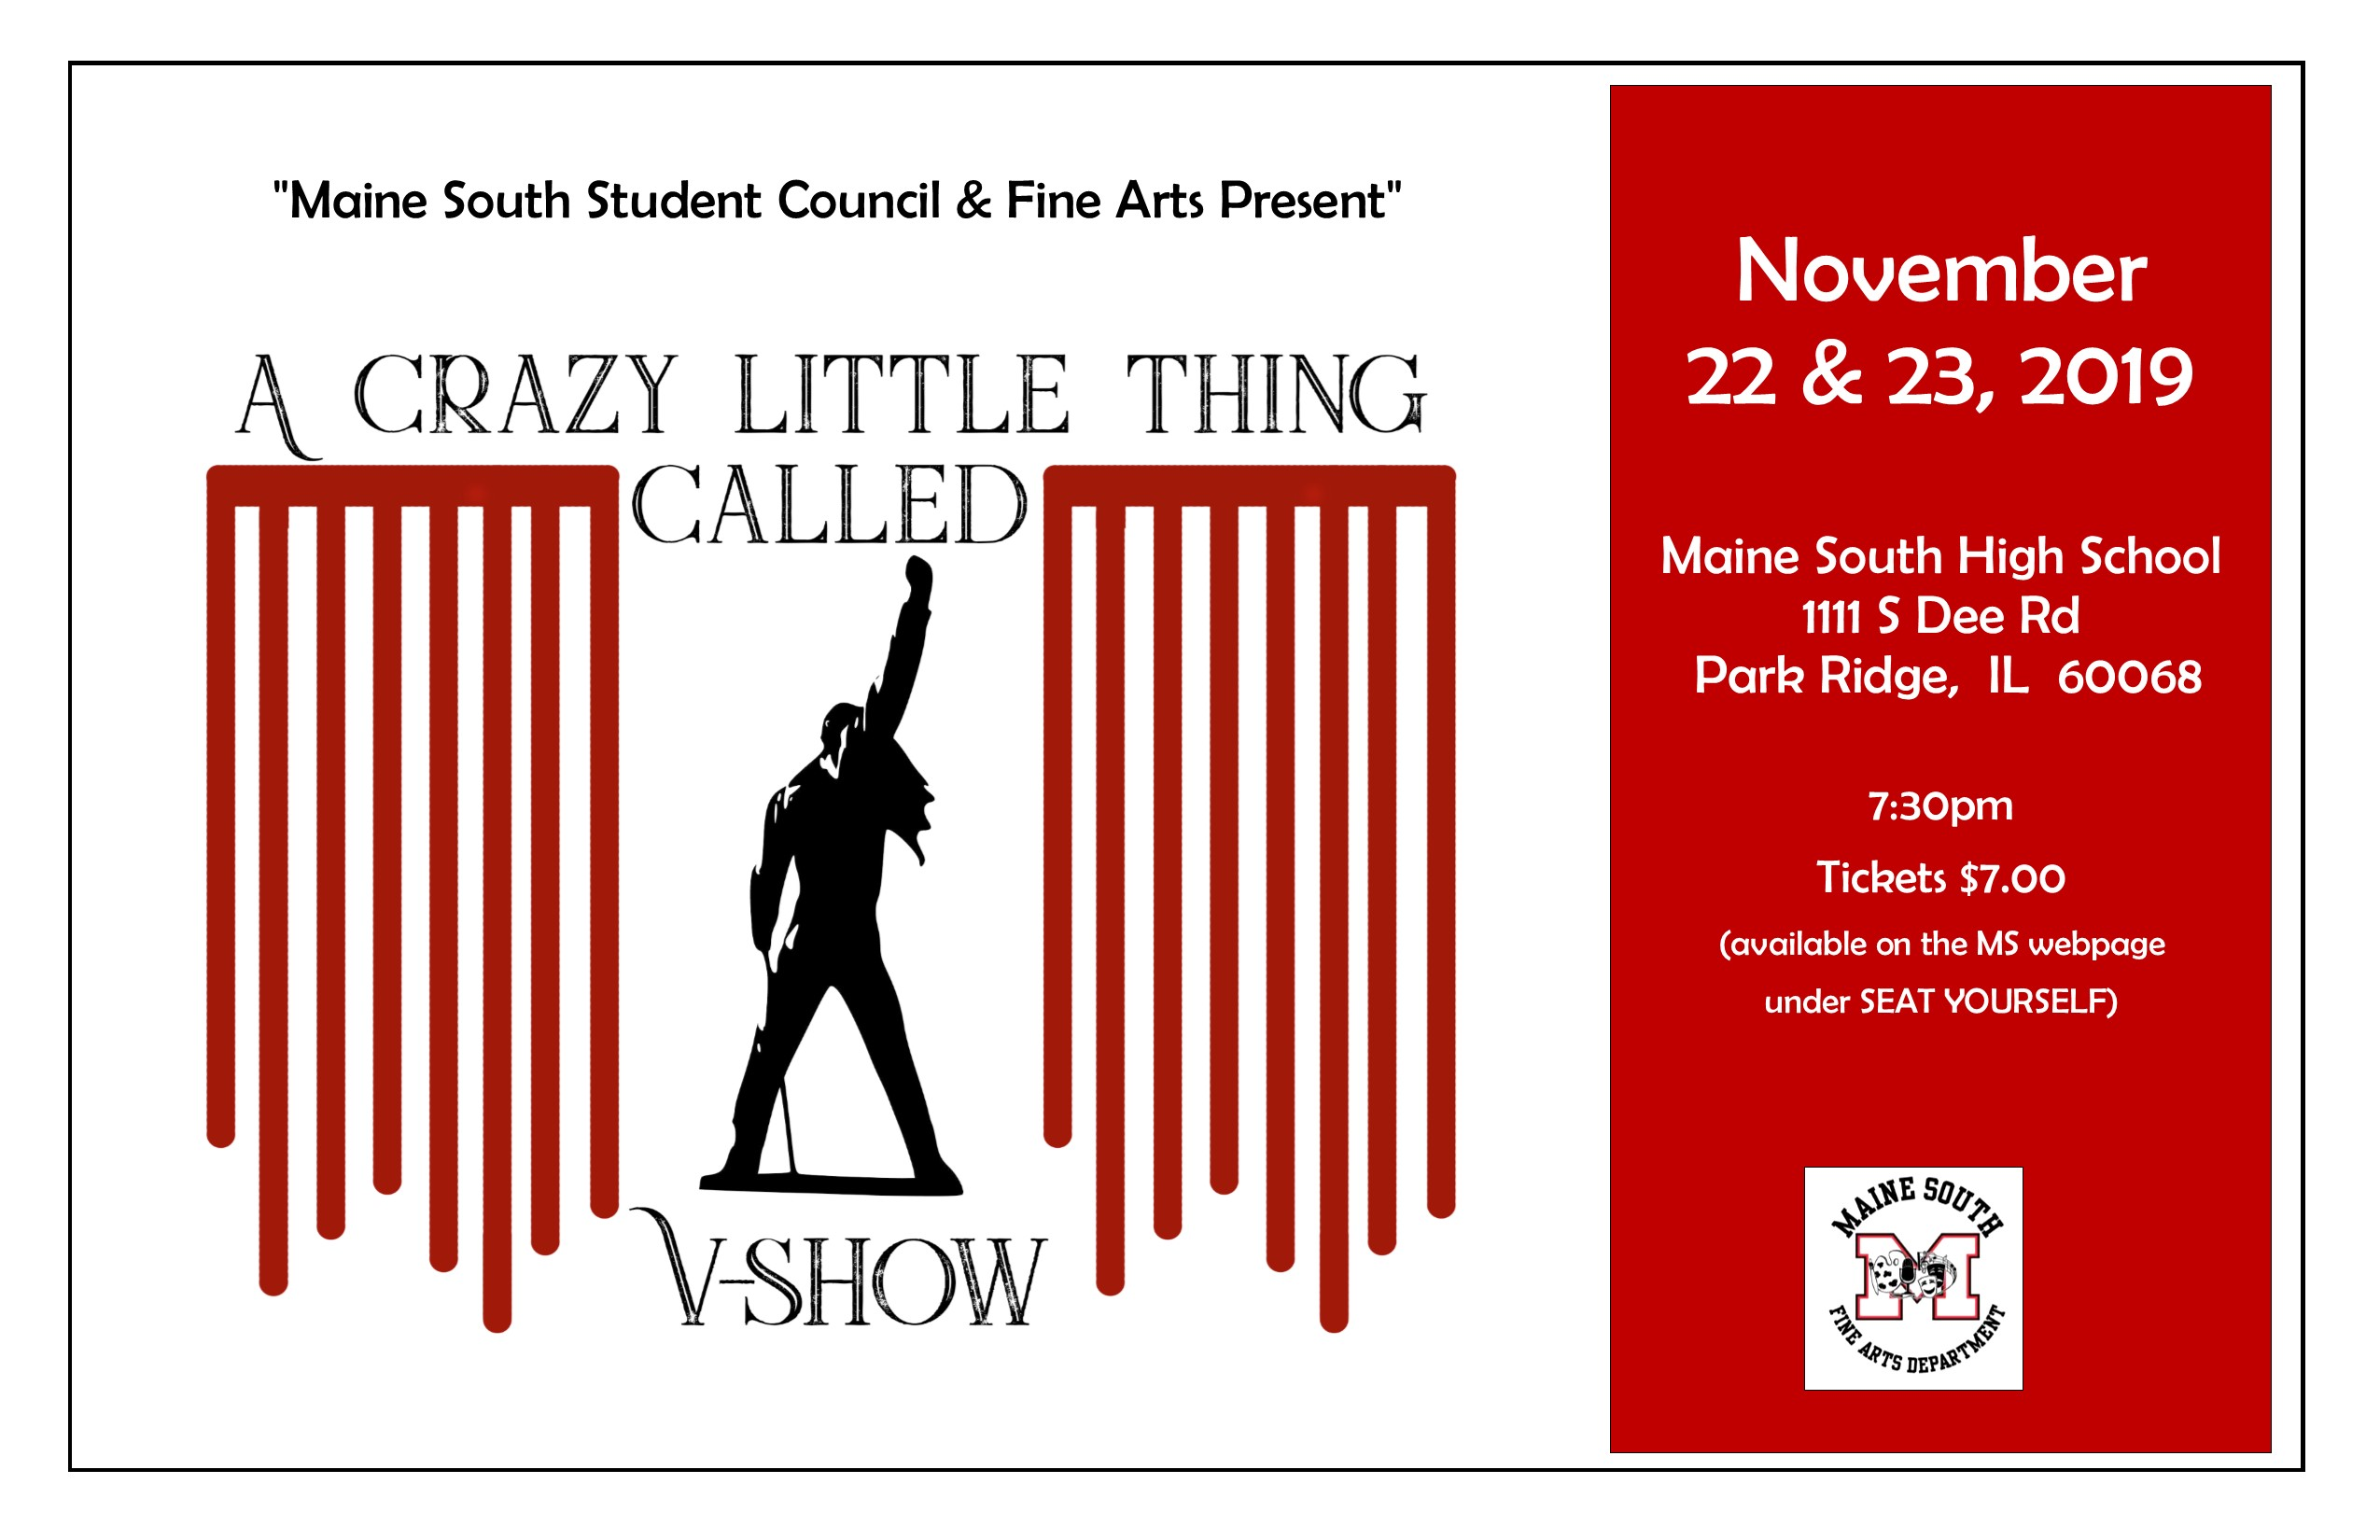 south movie 2019 n Maine South High School